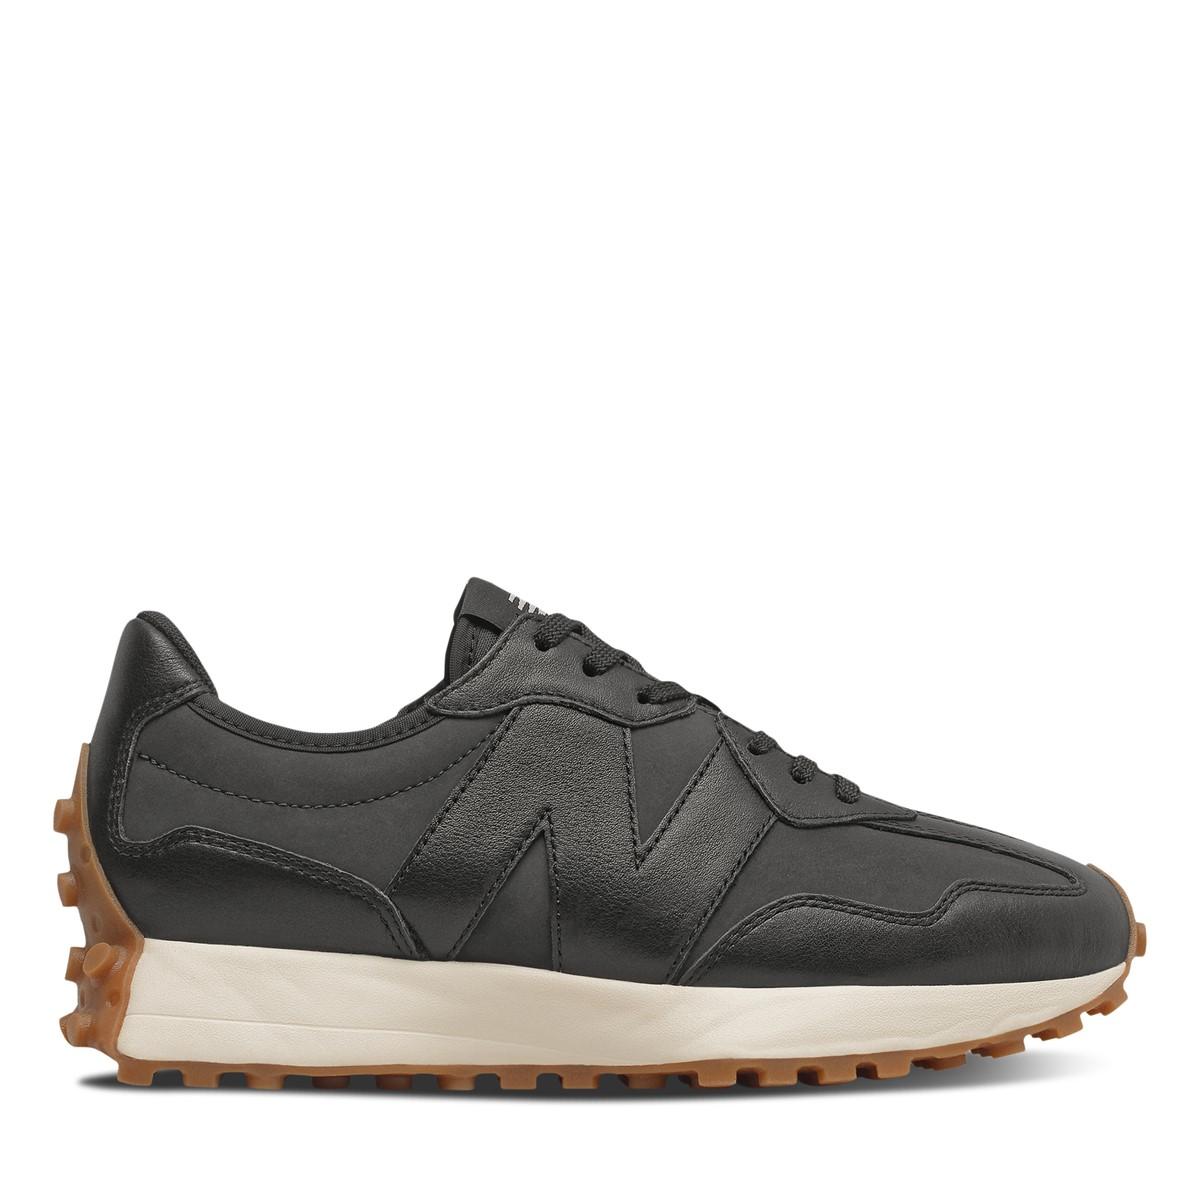 Women's 327 Sneakers in Black/Gum